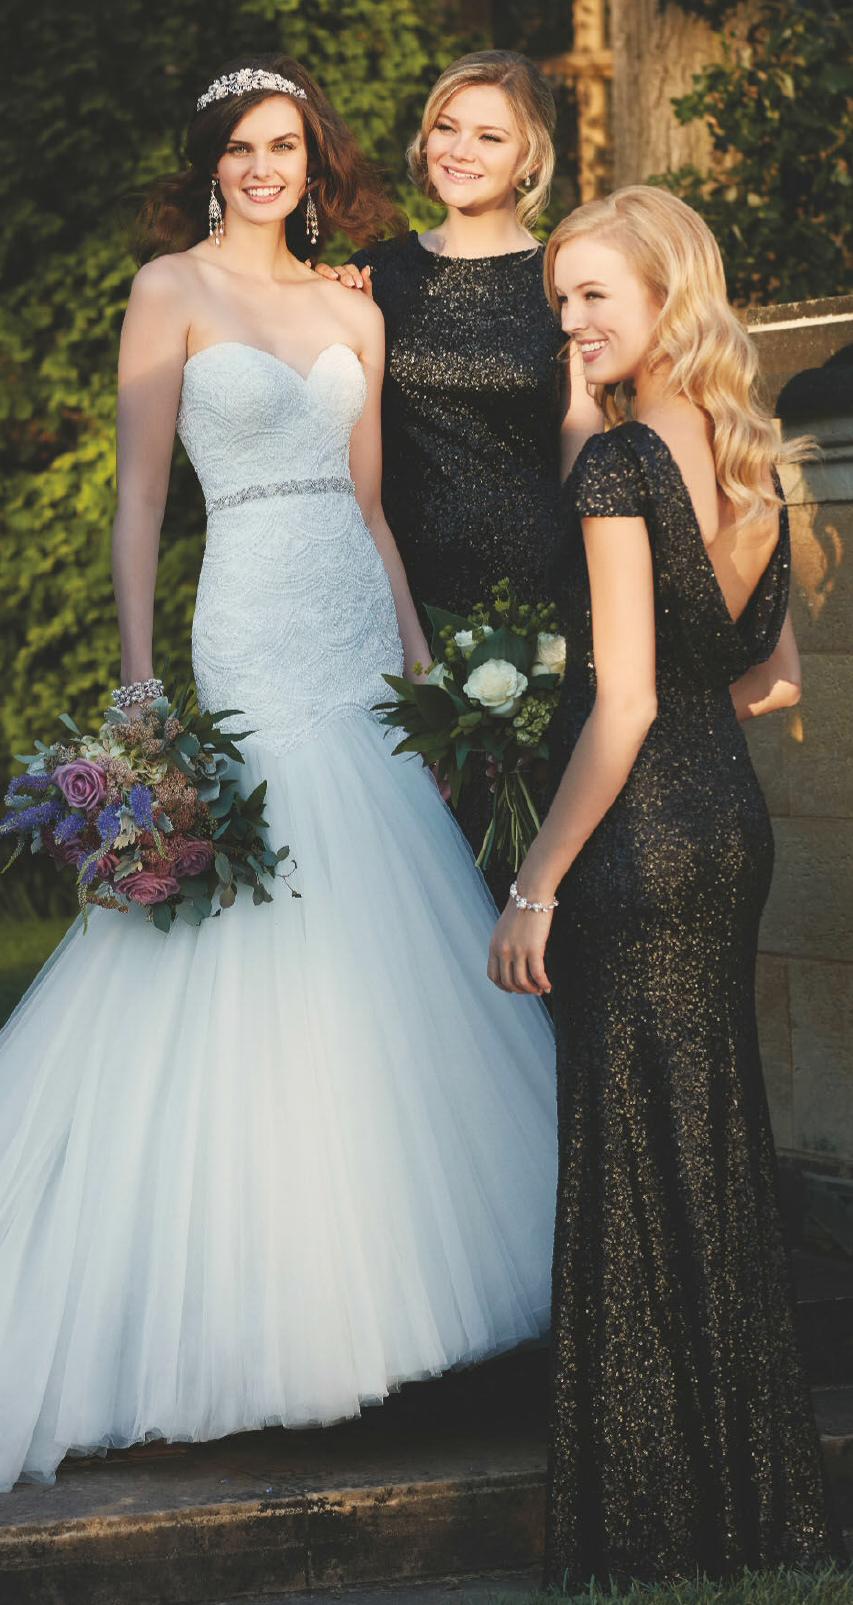 Golden+Black Bridesmaid Dress | Bridesmaid Dresses: STYLE-lish ...